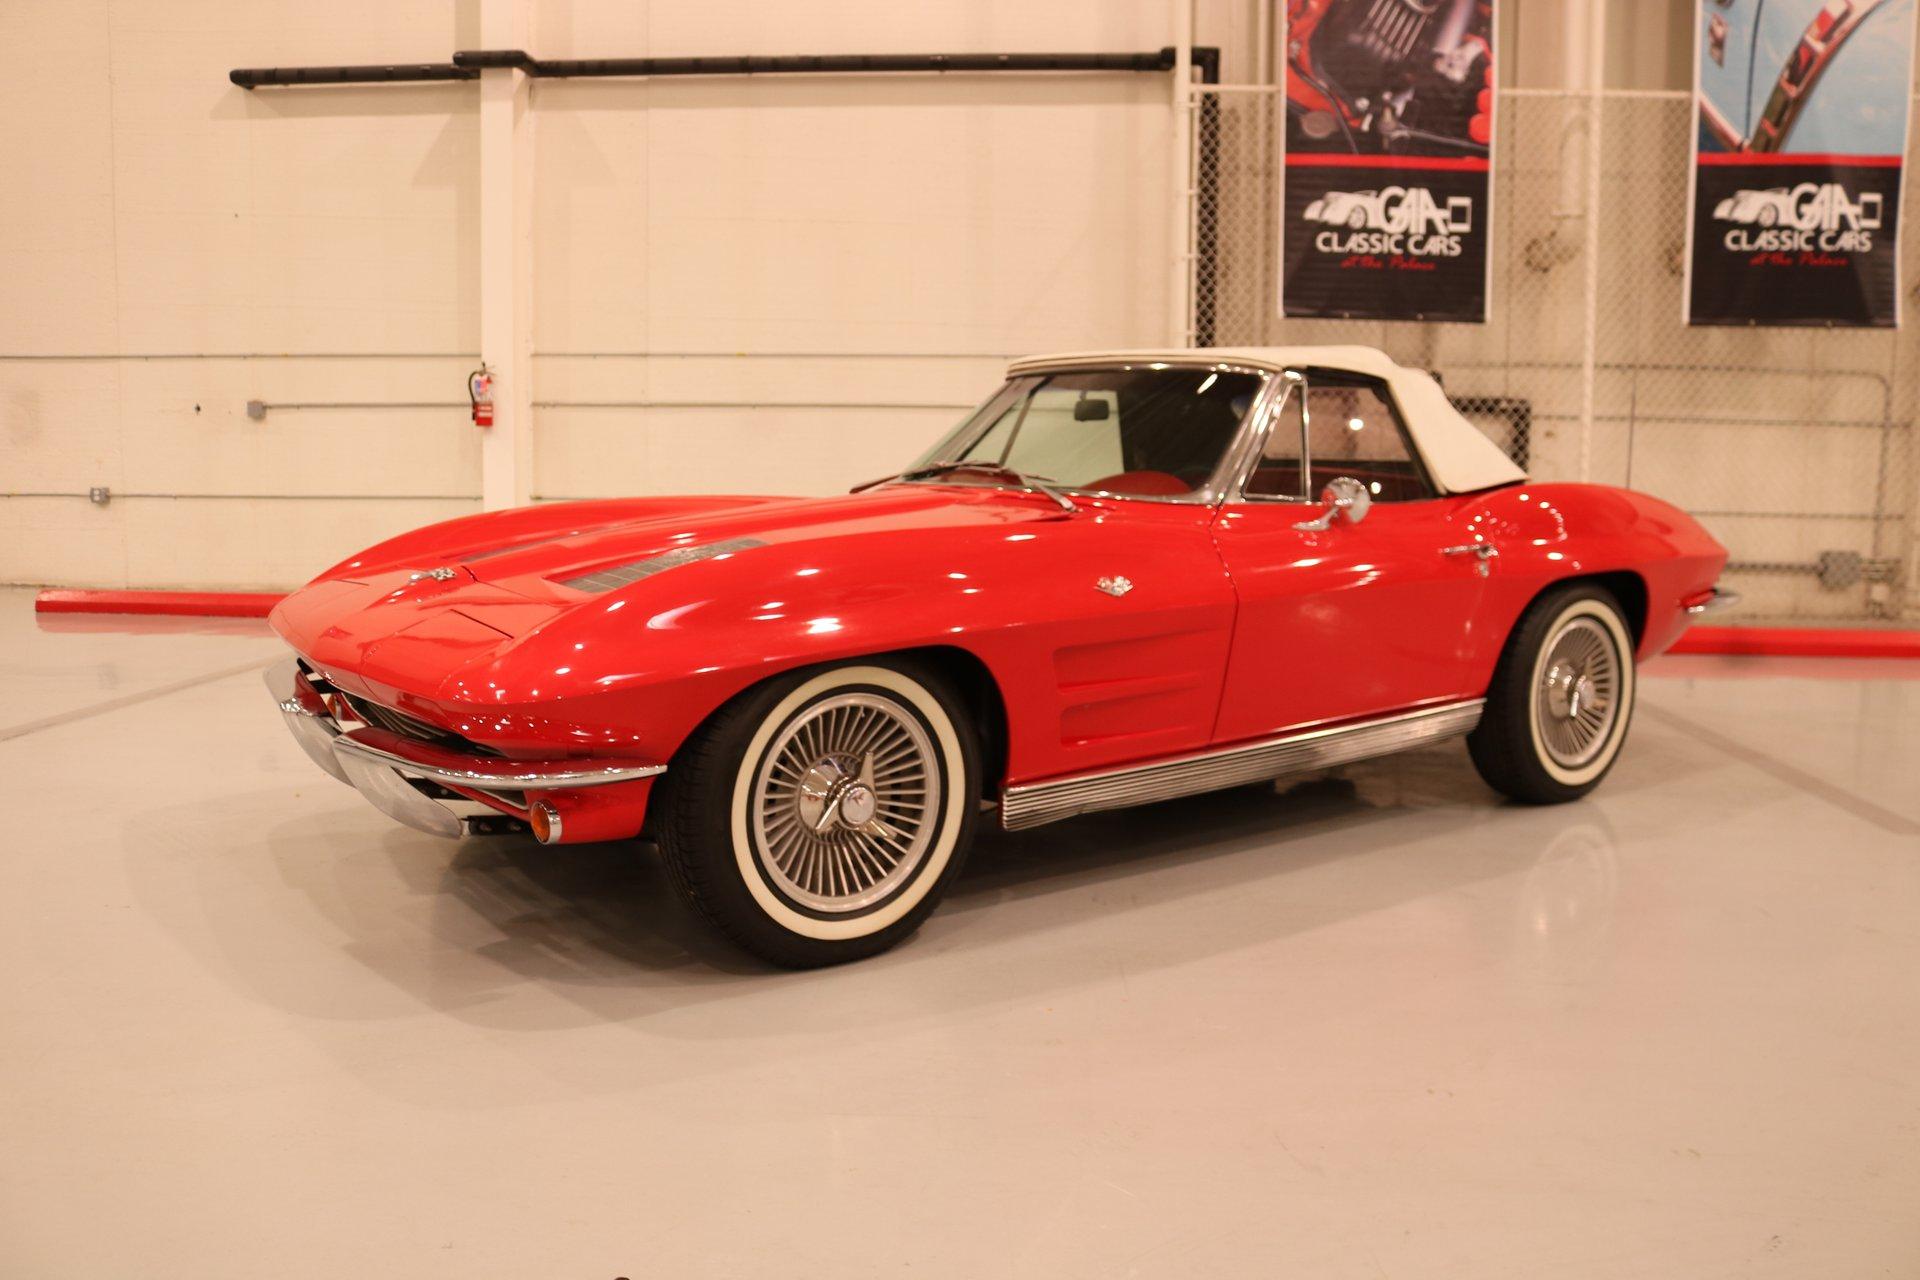 1963 Chevrolet Corvette | GAA Classic Cars